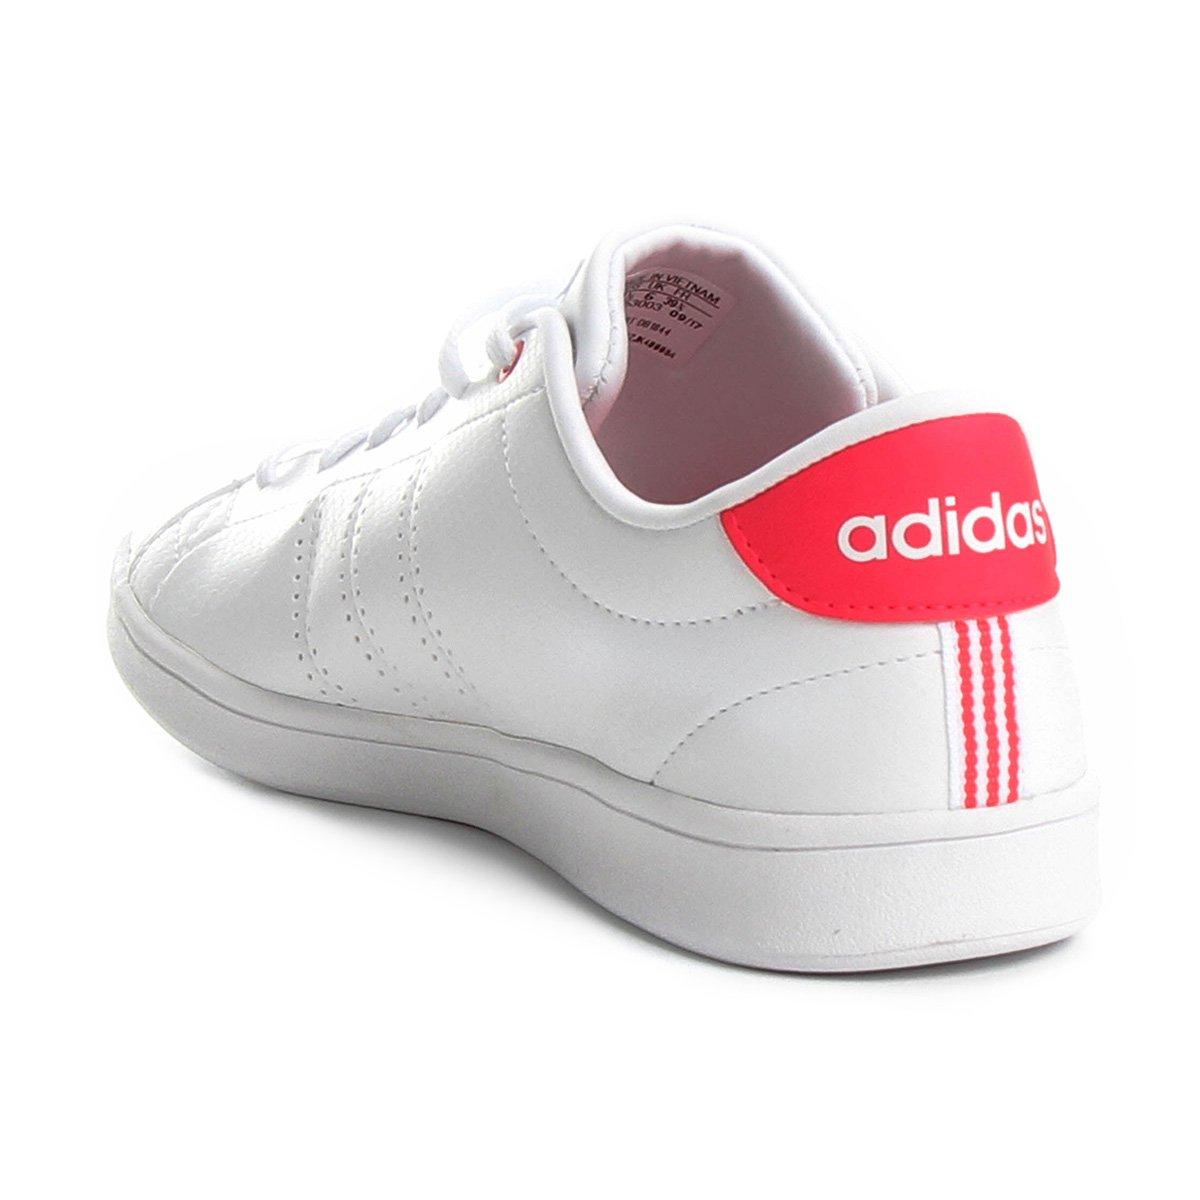 d3b9bcae0f ... Tênis Adidas Advantage Clean Qt Feminino - Branco e Pink - Compre .